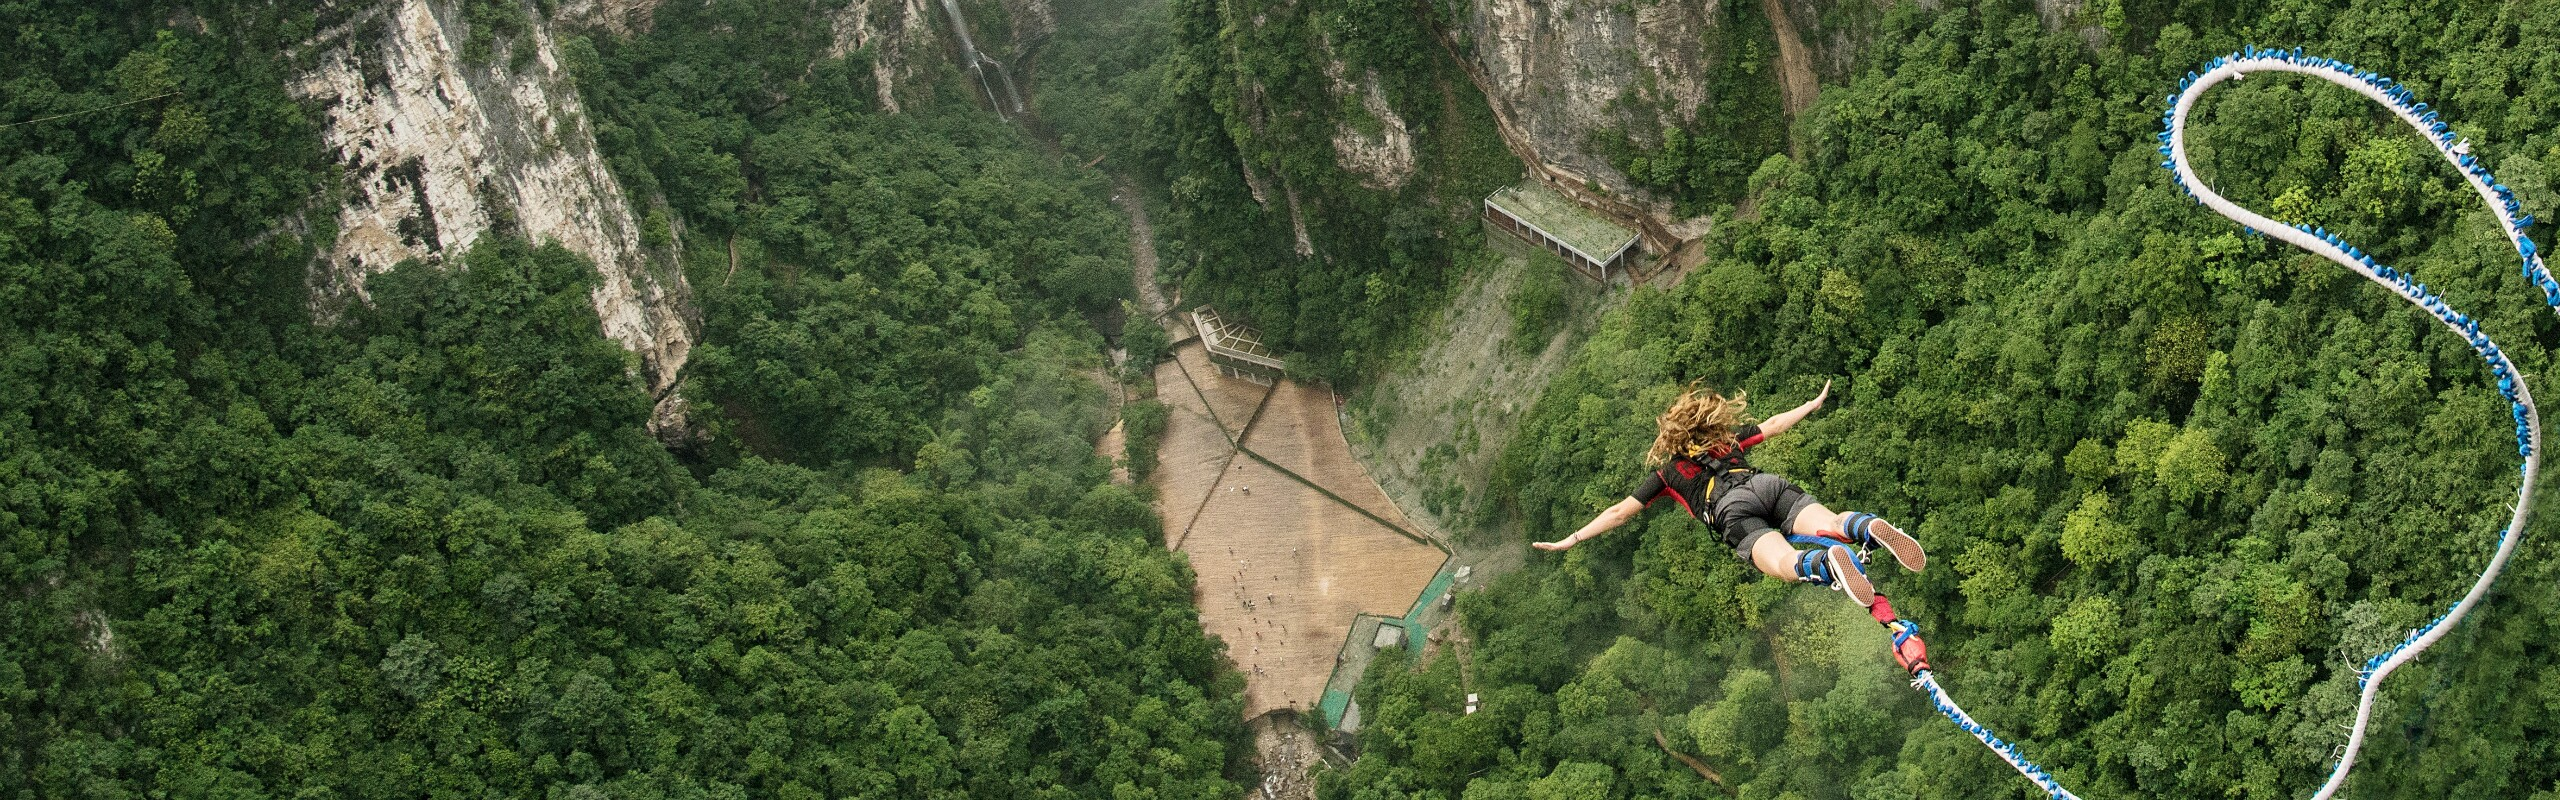 5 Days Zhangjiajie Hiking and Biking Tour for Any Level